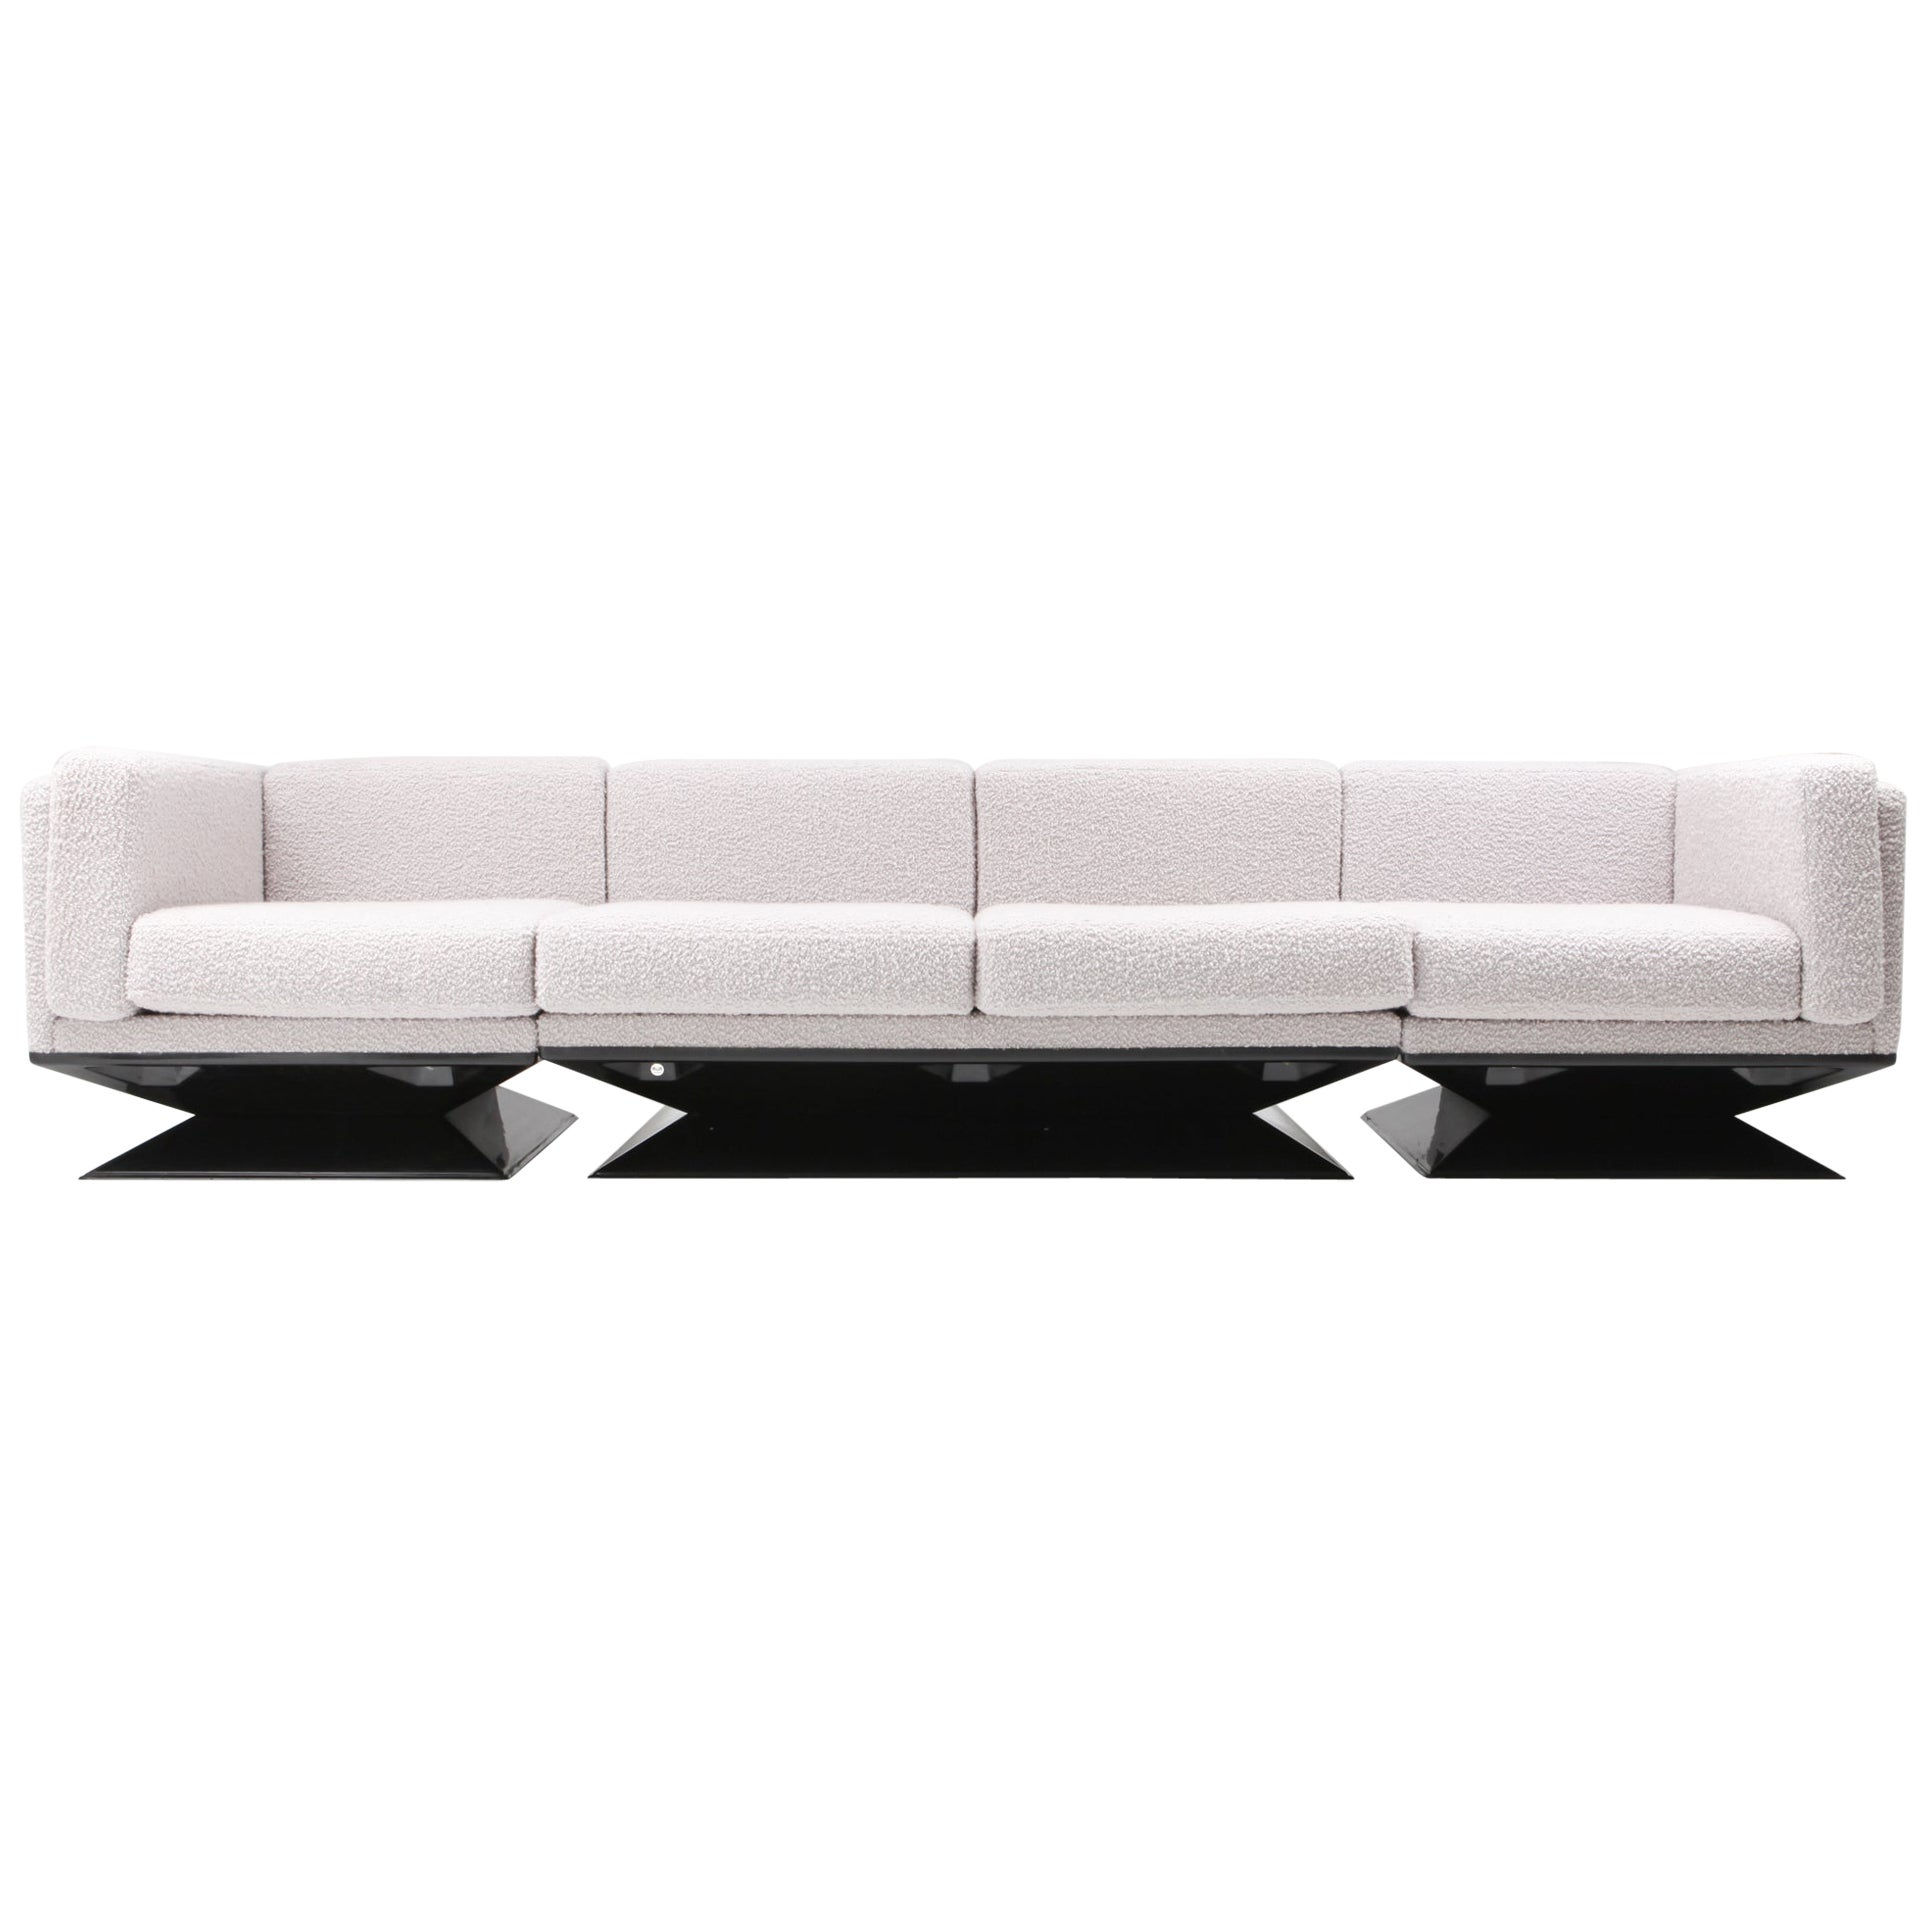 MIM Roma Sectional Sofa in Bouclé Wool by Luigi Pellegrin